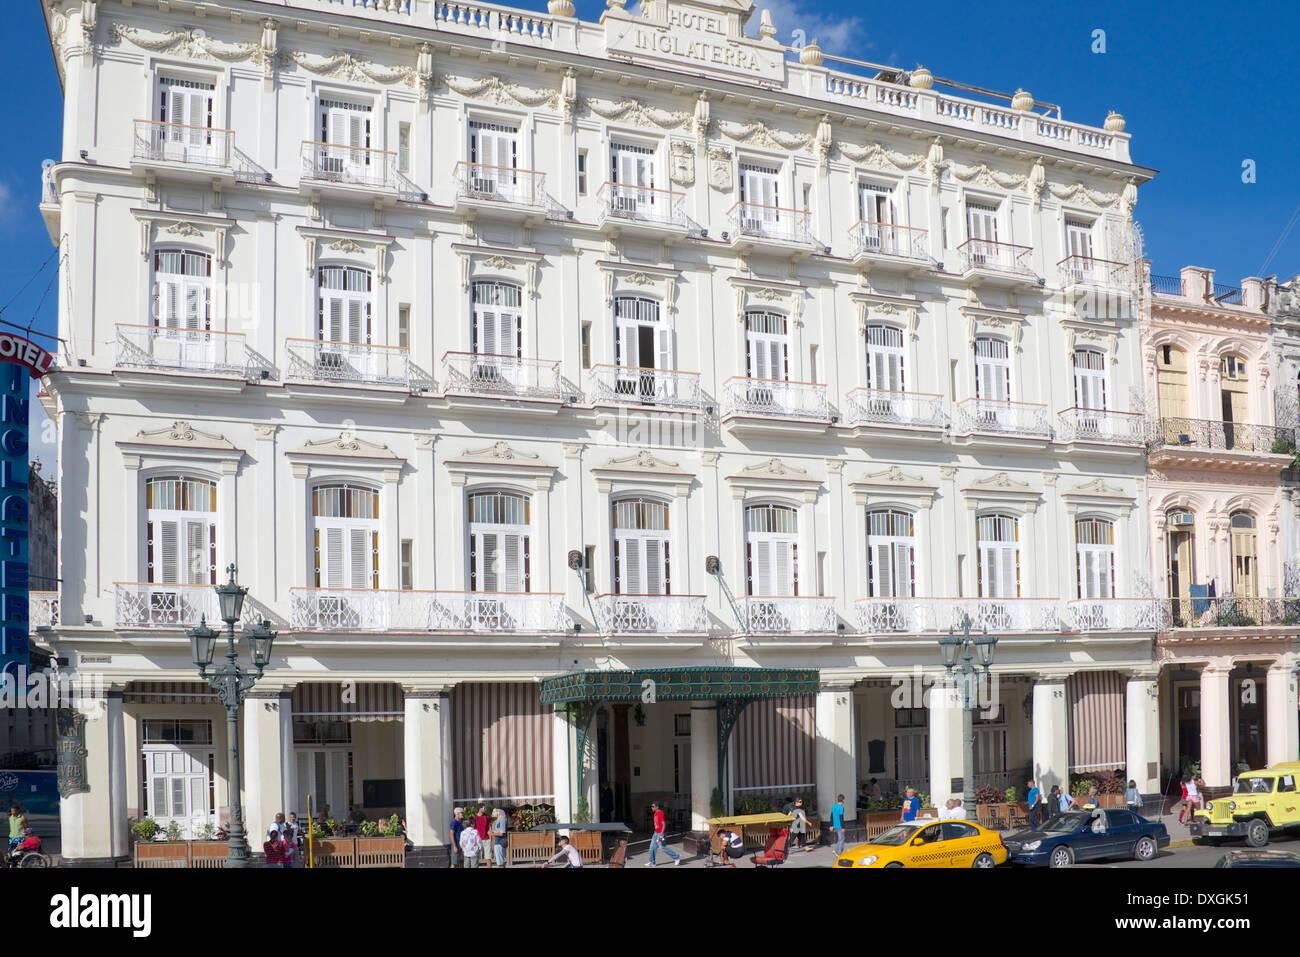 Hotel Inglaterra Paseo di Marti Central Havana Cuba - Stock Image